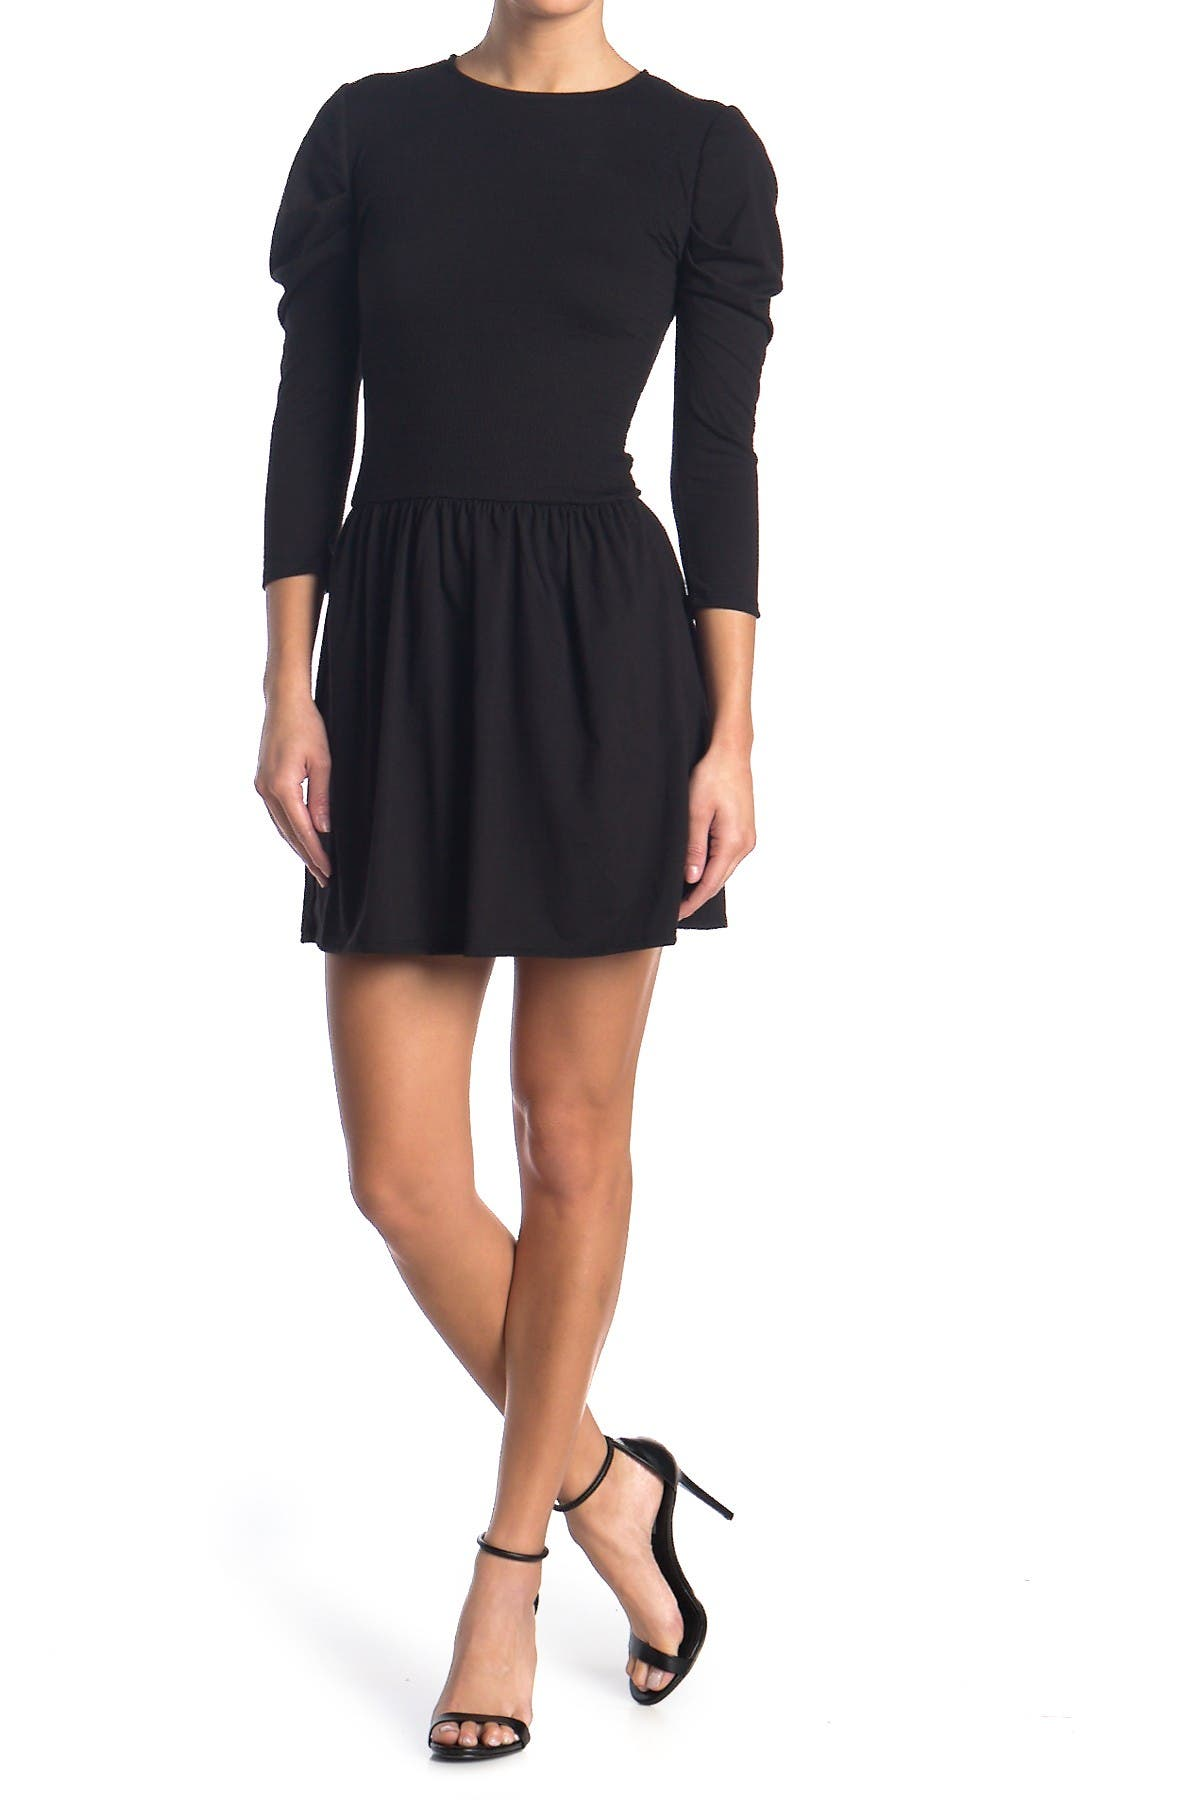 Image of Velvet Torch Puff Sleeve Jewel Neck Mini Dress